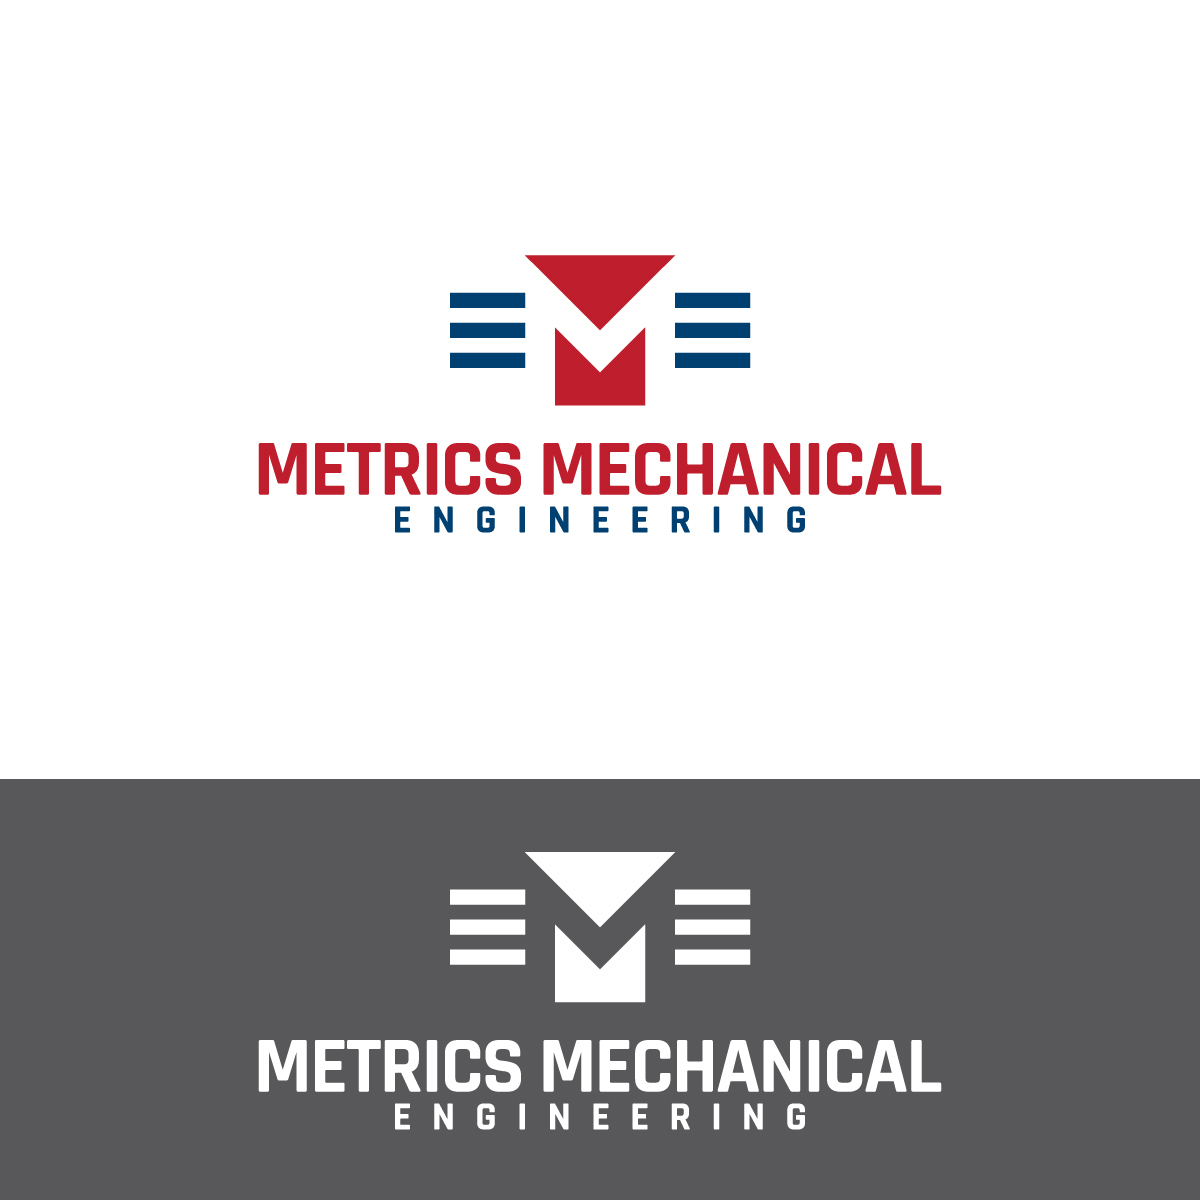 hight resolution of logo design by lokiasan for metrics mechanical engineering design 14059397